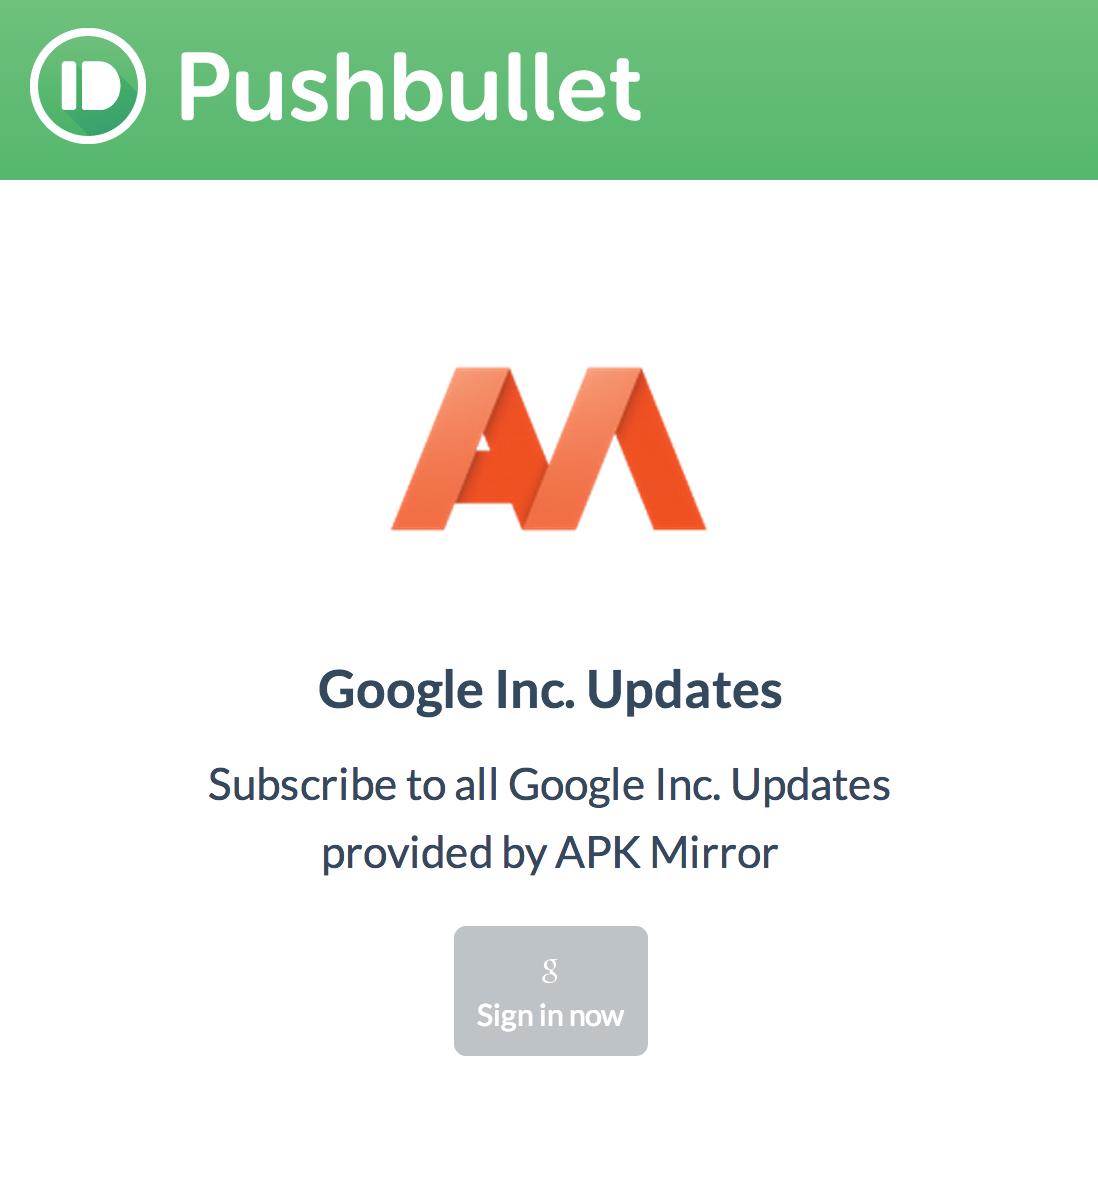 netflix apk mirror android 4.4